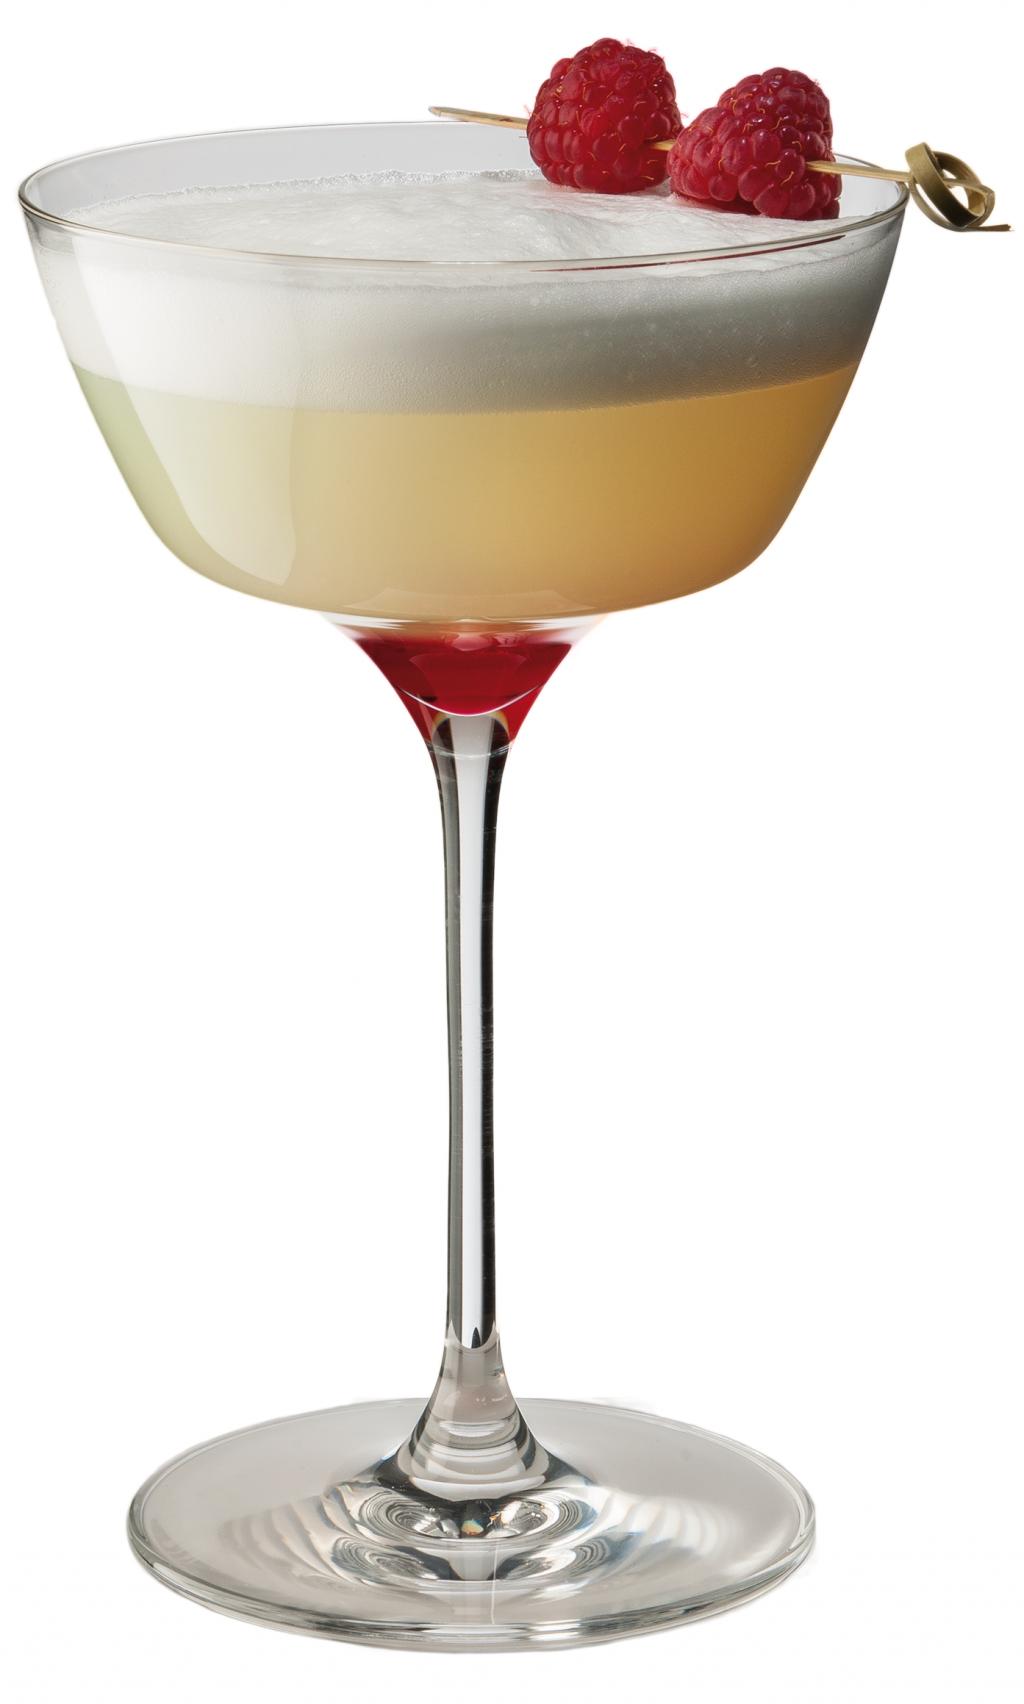 Copa giona c ctel vintage 28cl exportcave for Vasos de coctel